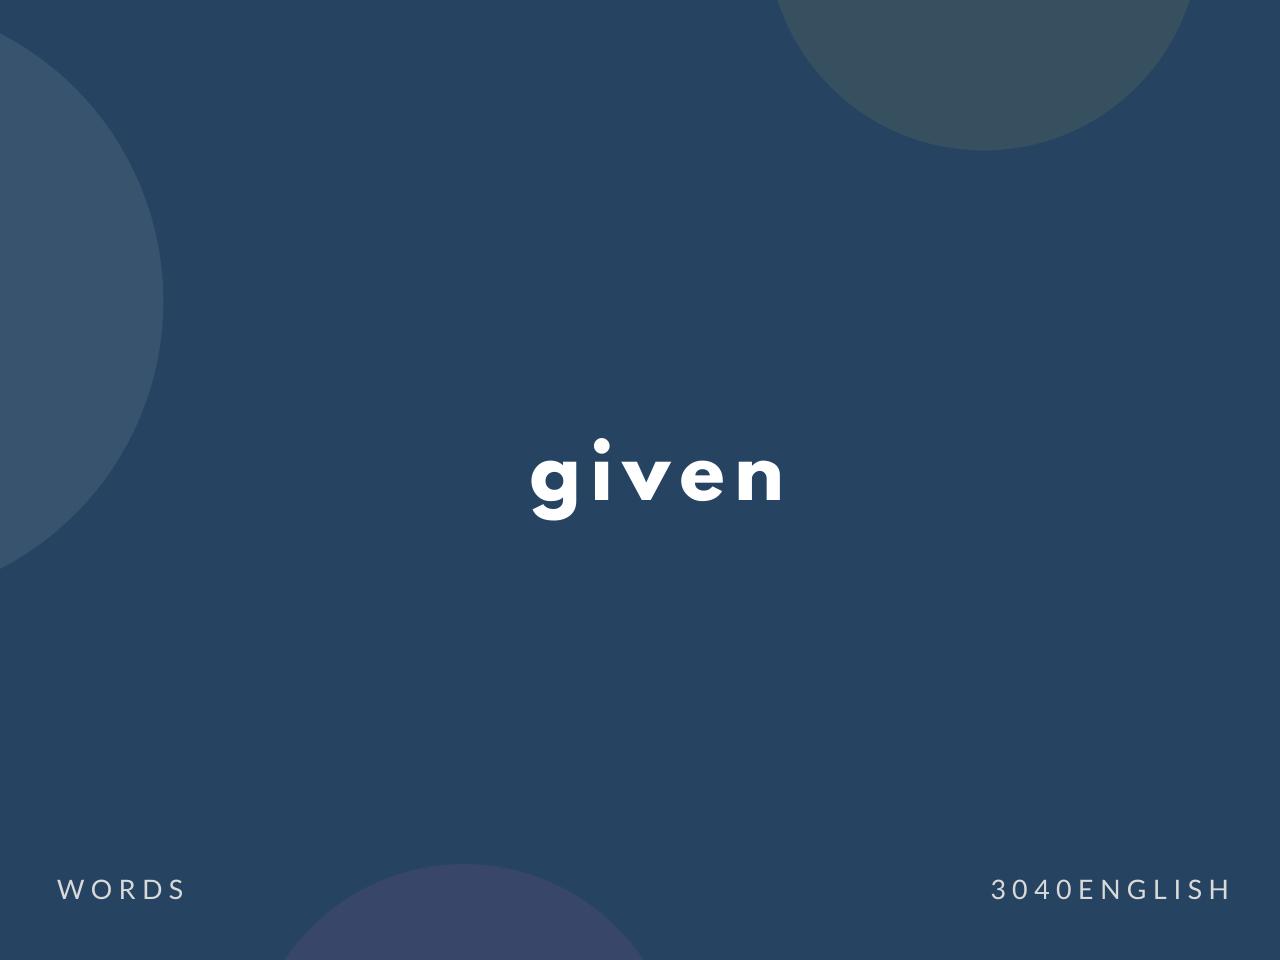 given の意味と簡単な使い方【音読用例文あり】